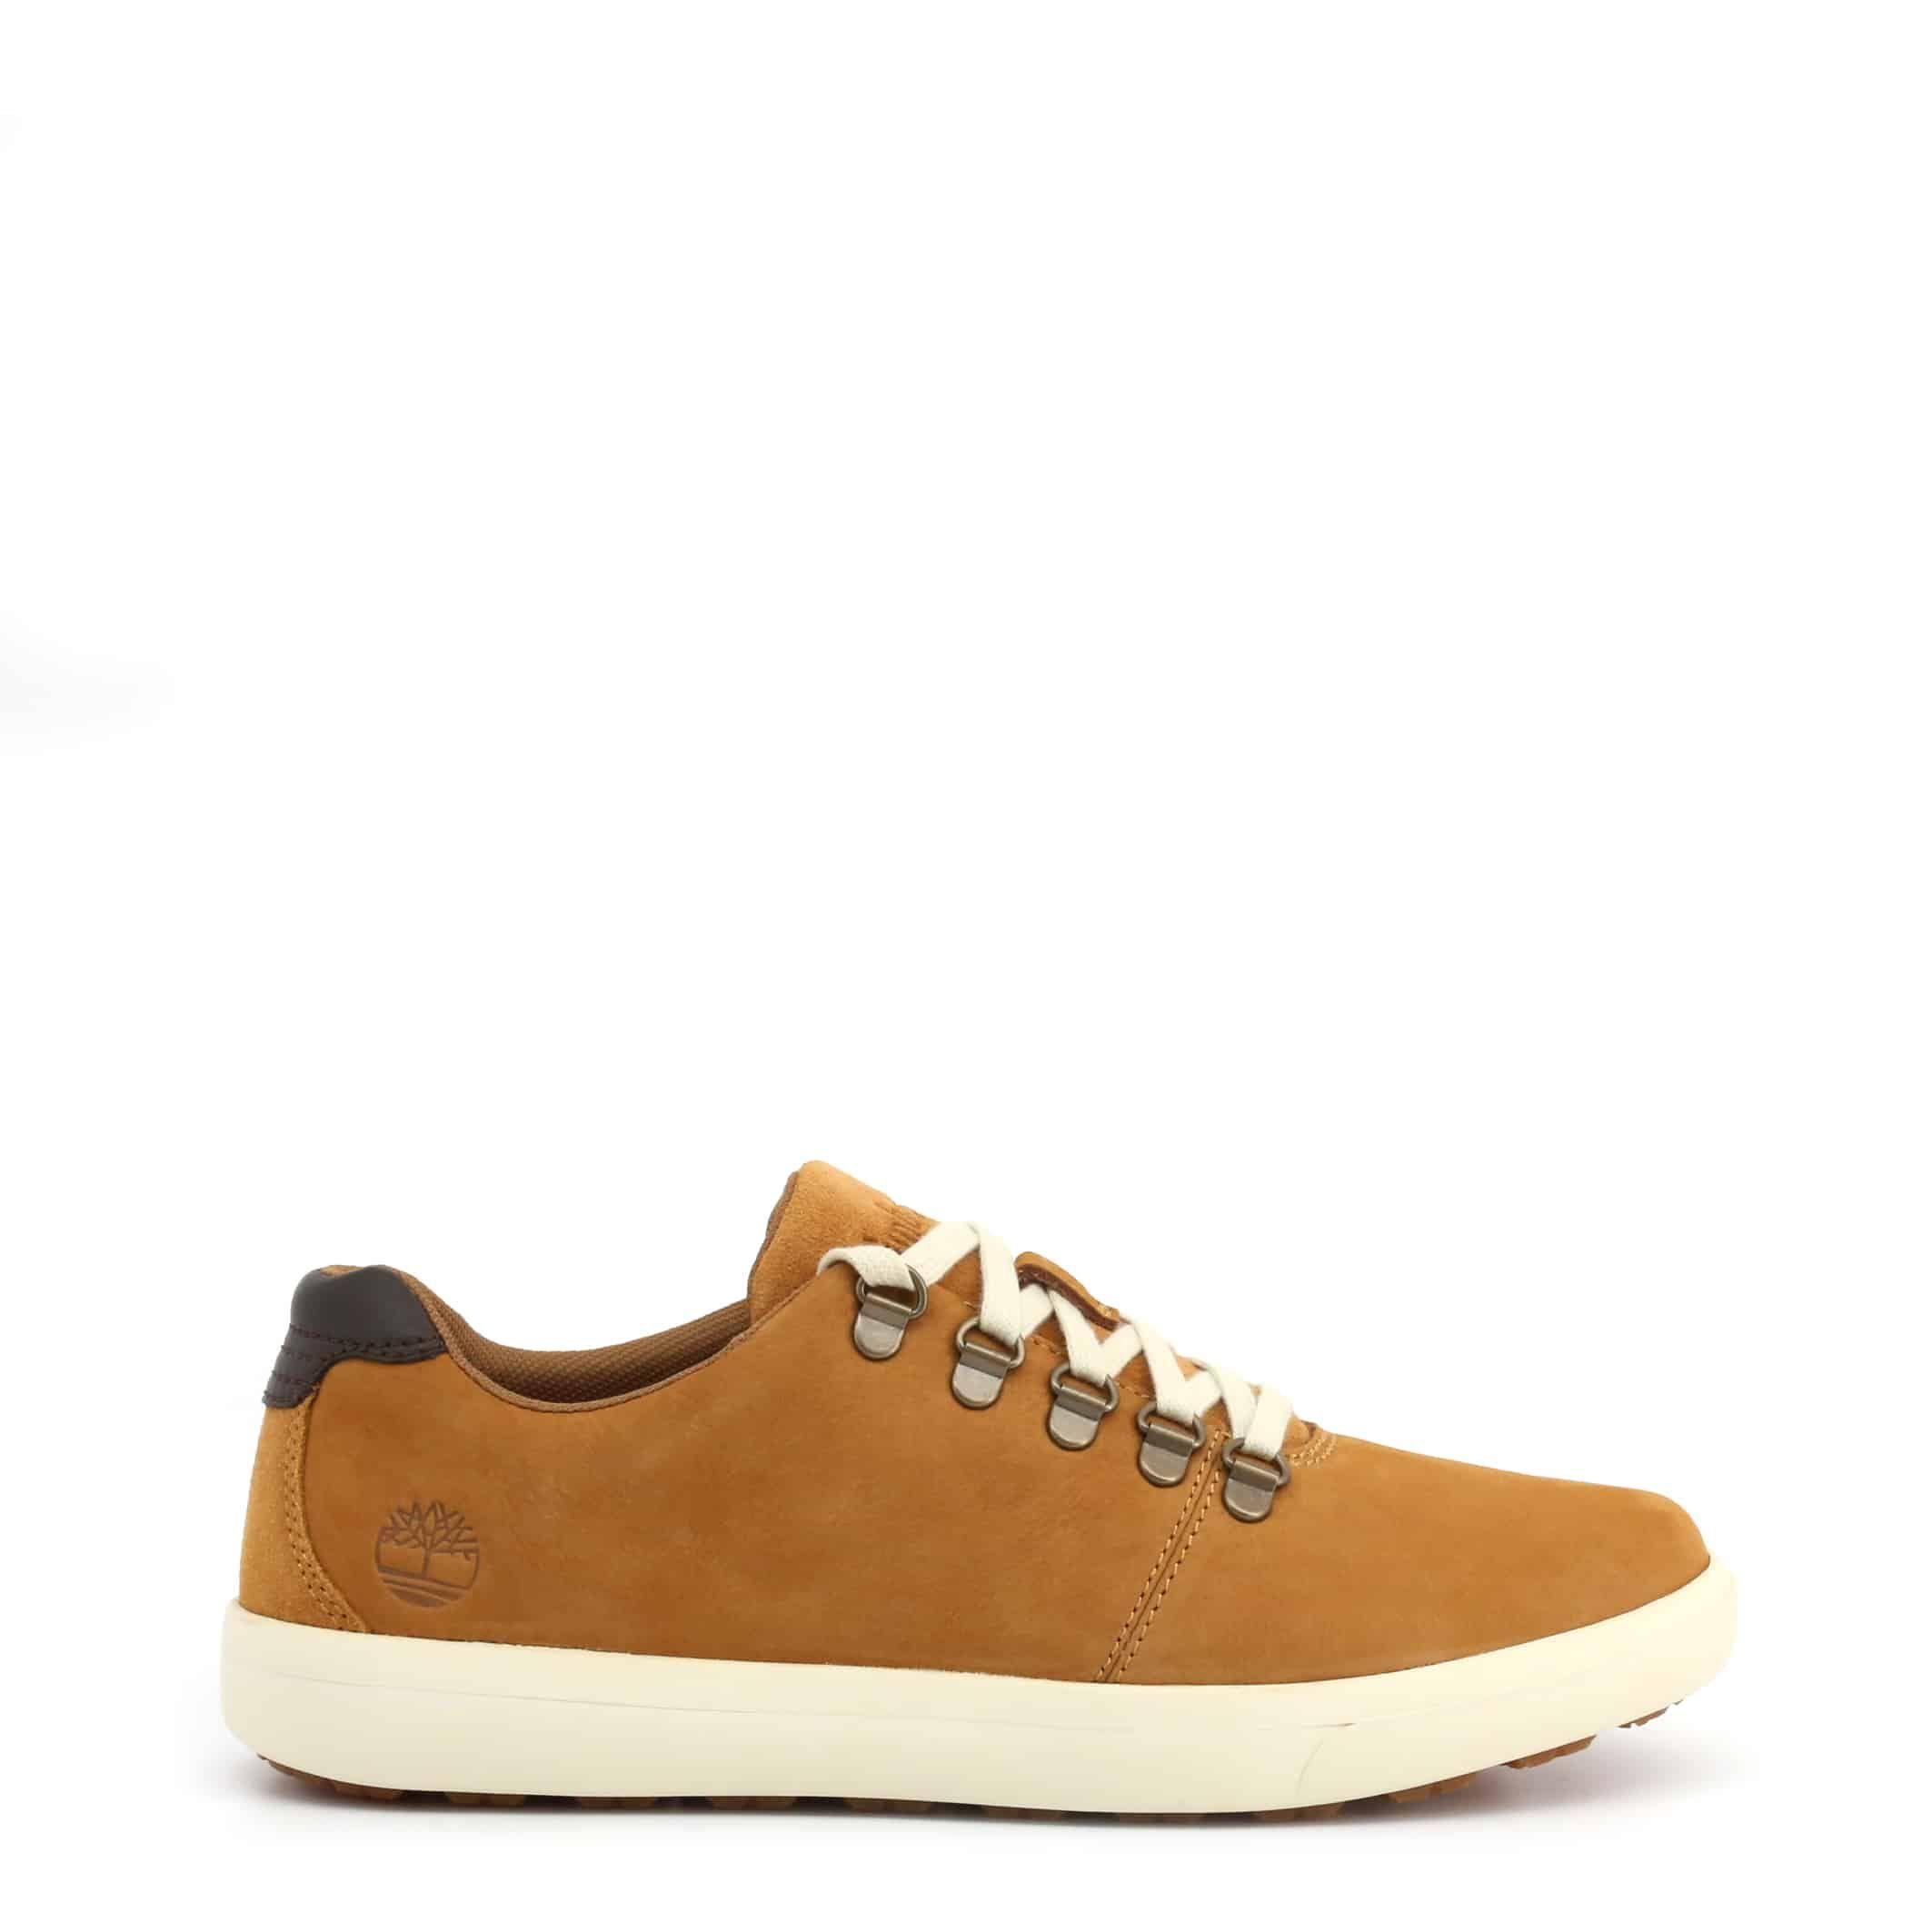 Schuhe Timberland – ASHWD-ALPINE – Braun